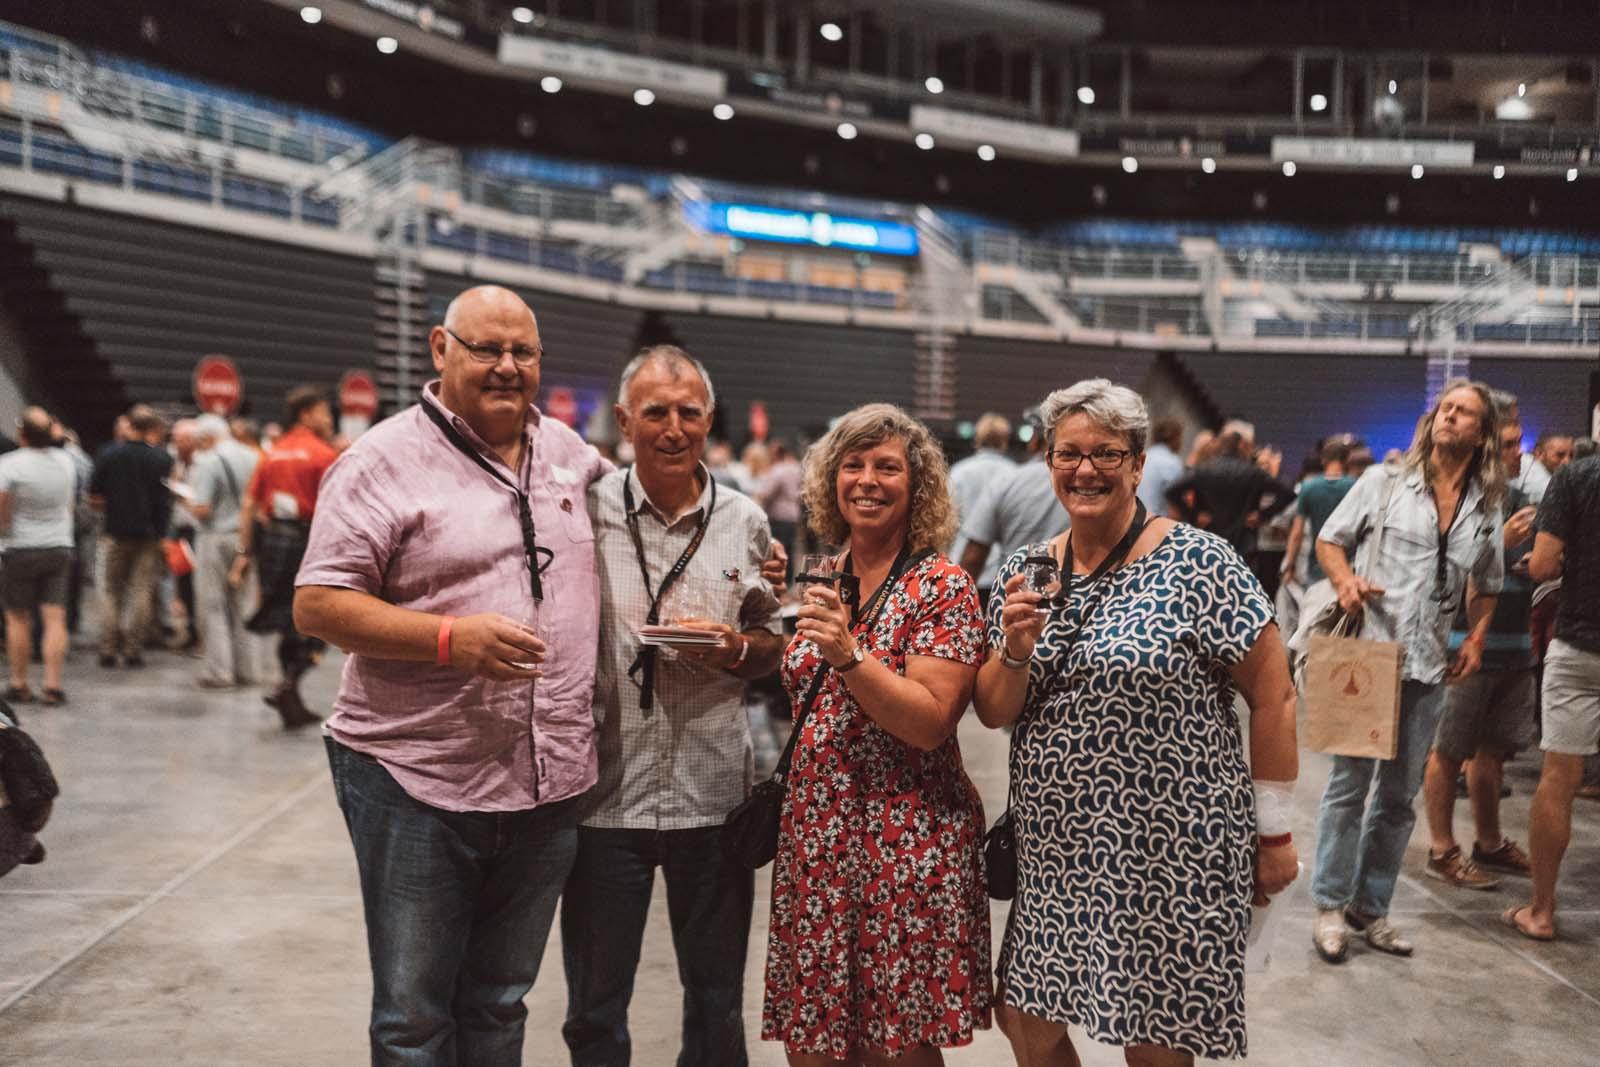 Dramfest 2018 for Whisky Galore-362.jpg